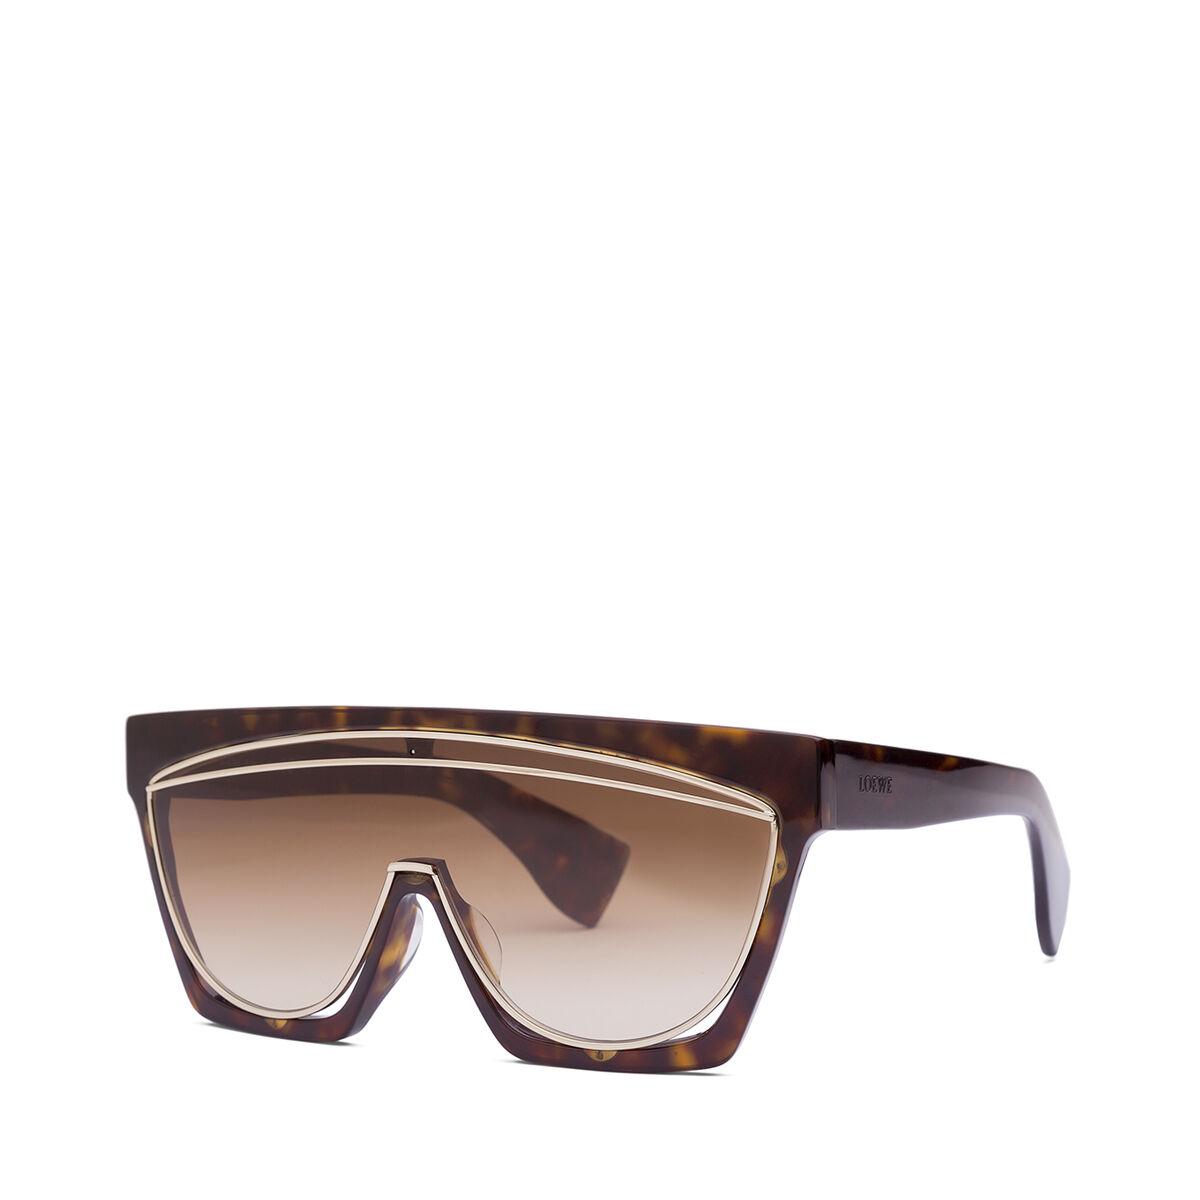 LOEWE Gafas Mascara Havana Oscuro/Marron Degradado all